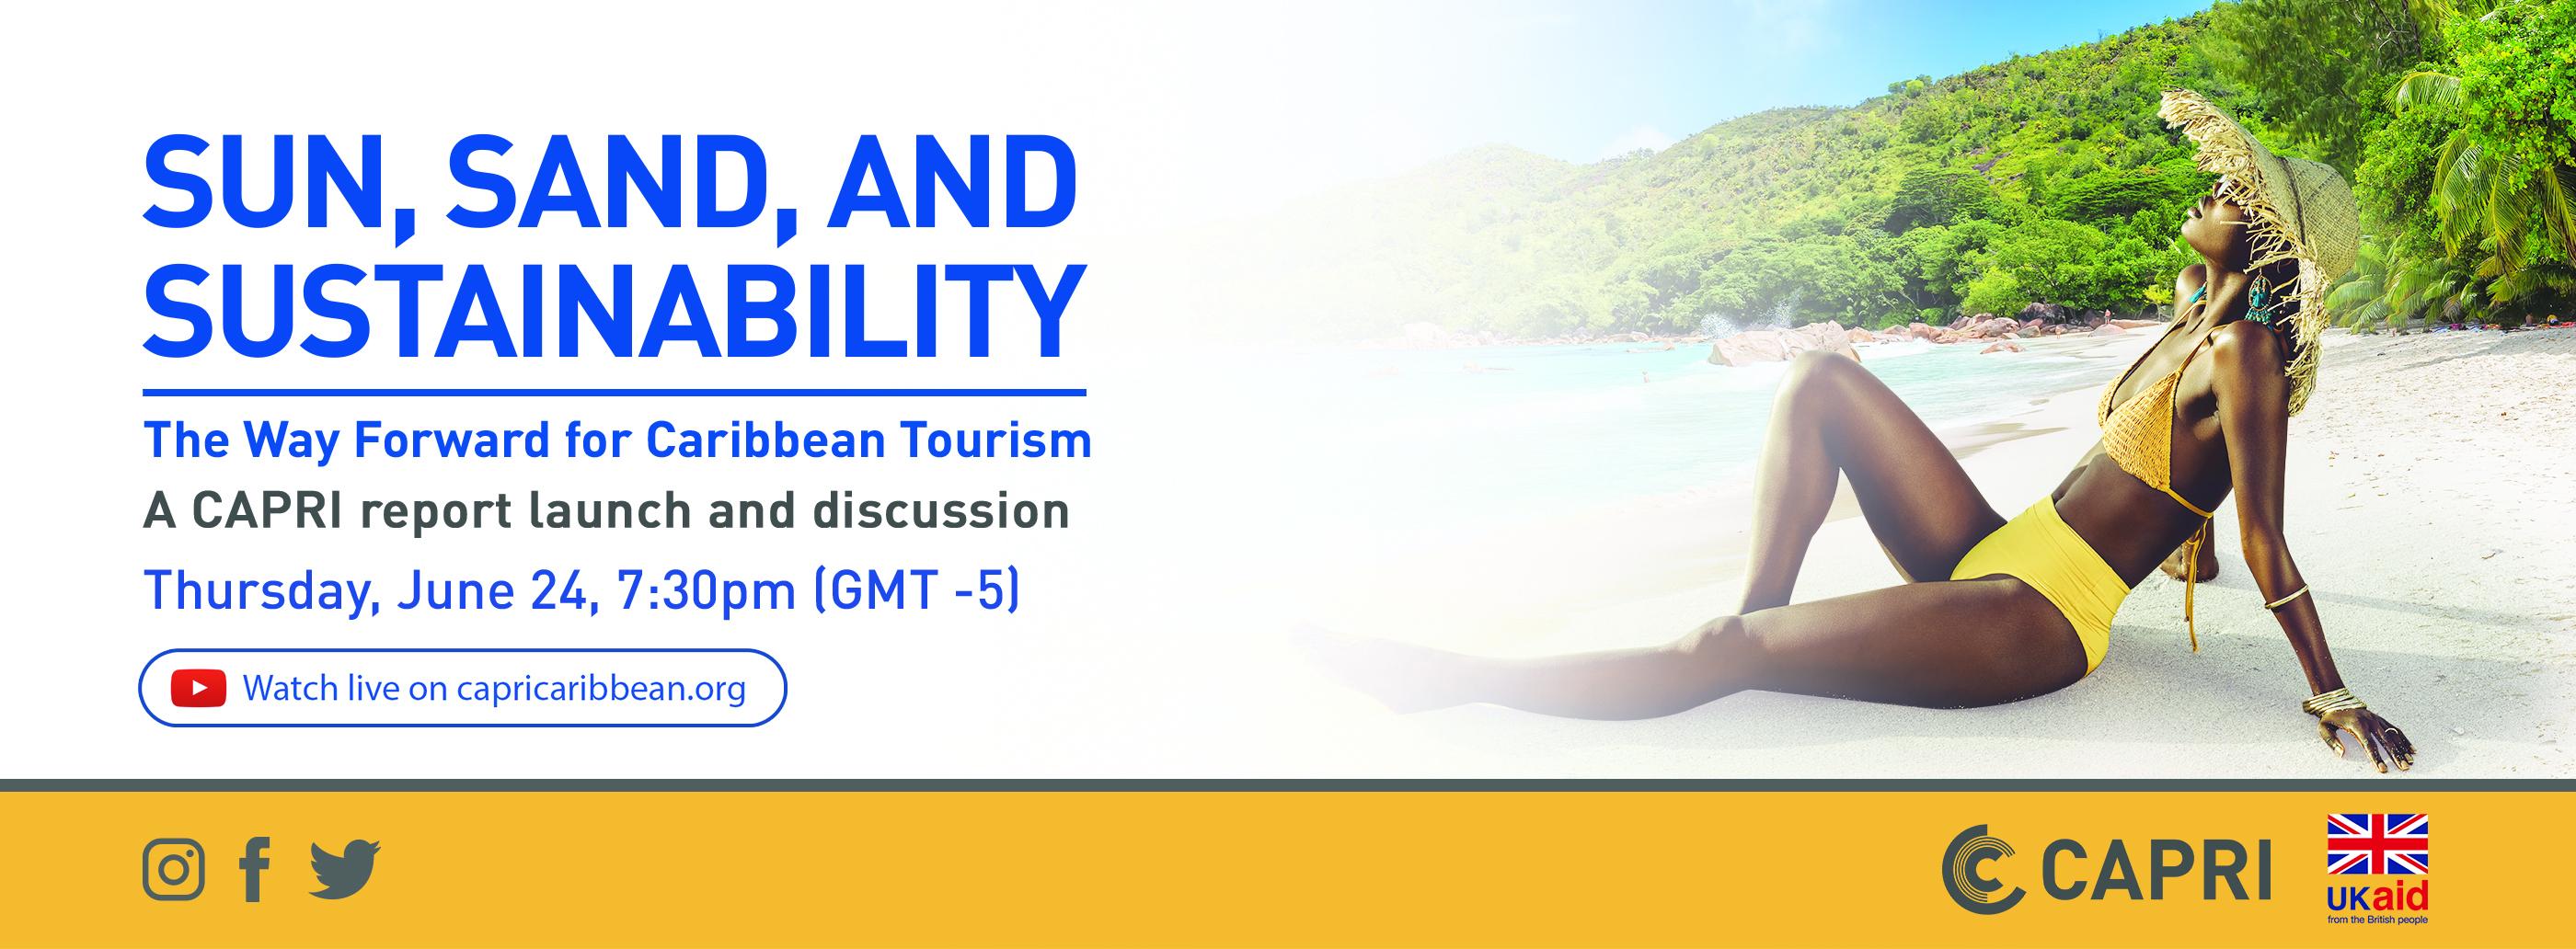 capri_sun_sand_tourism_web_banner.jpg